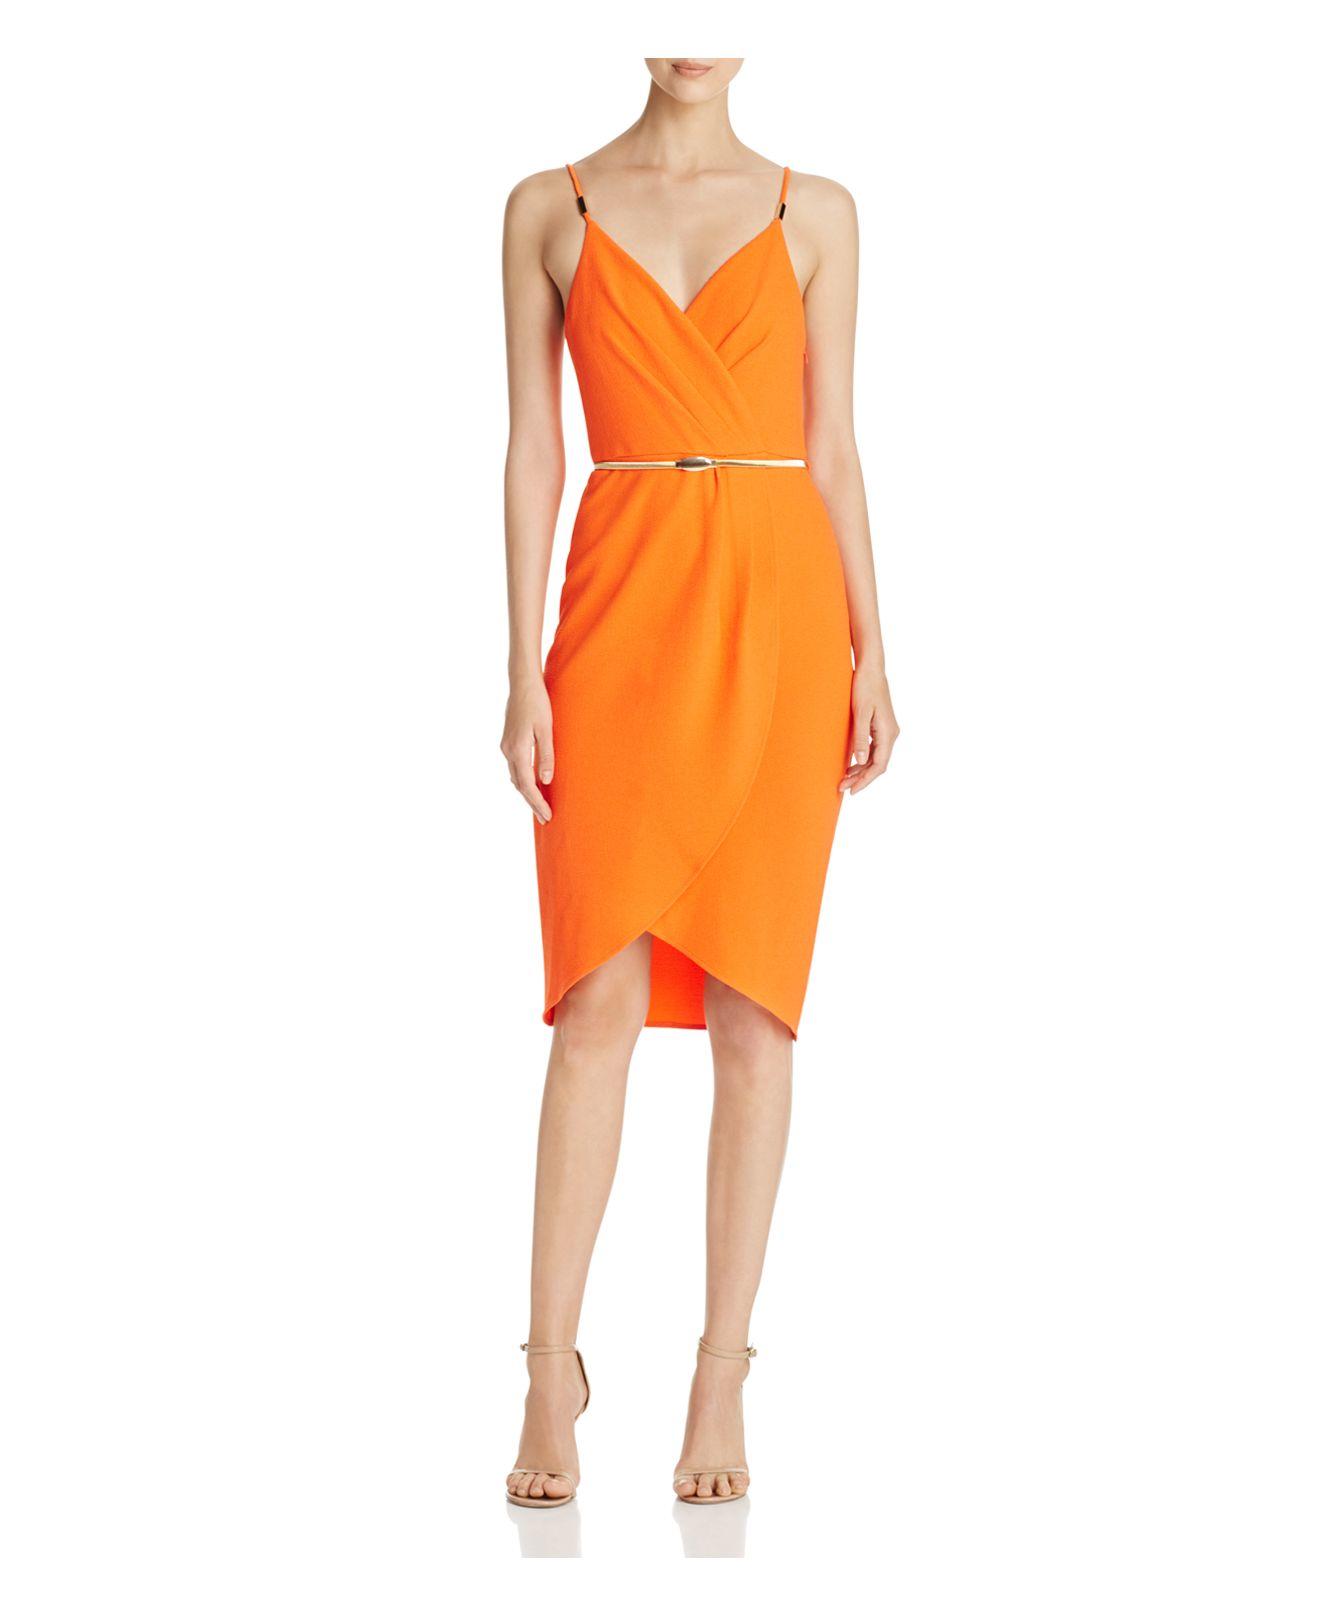 Aqua Wrap Detail Cocktail Dress in Orange